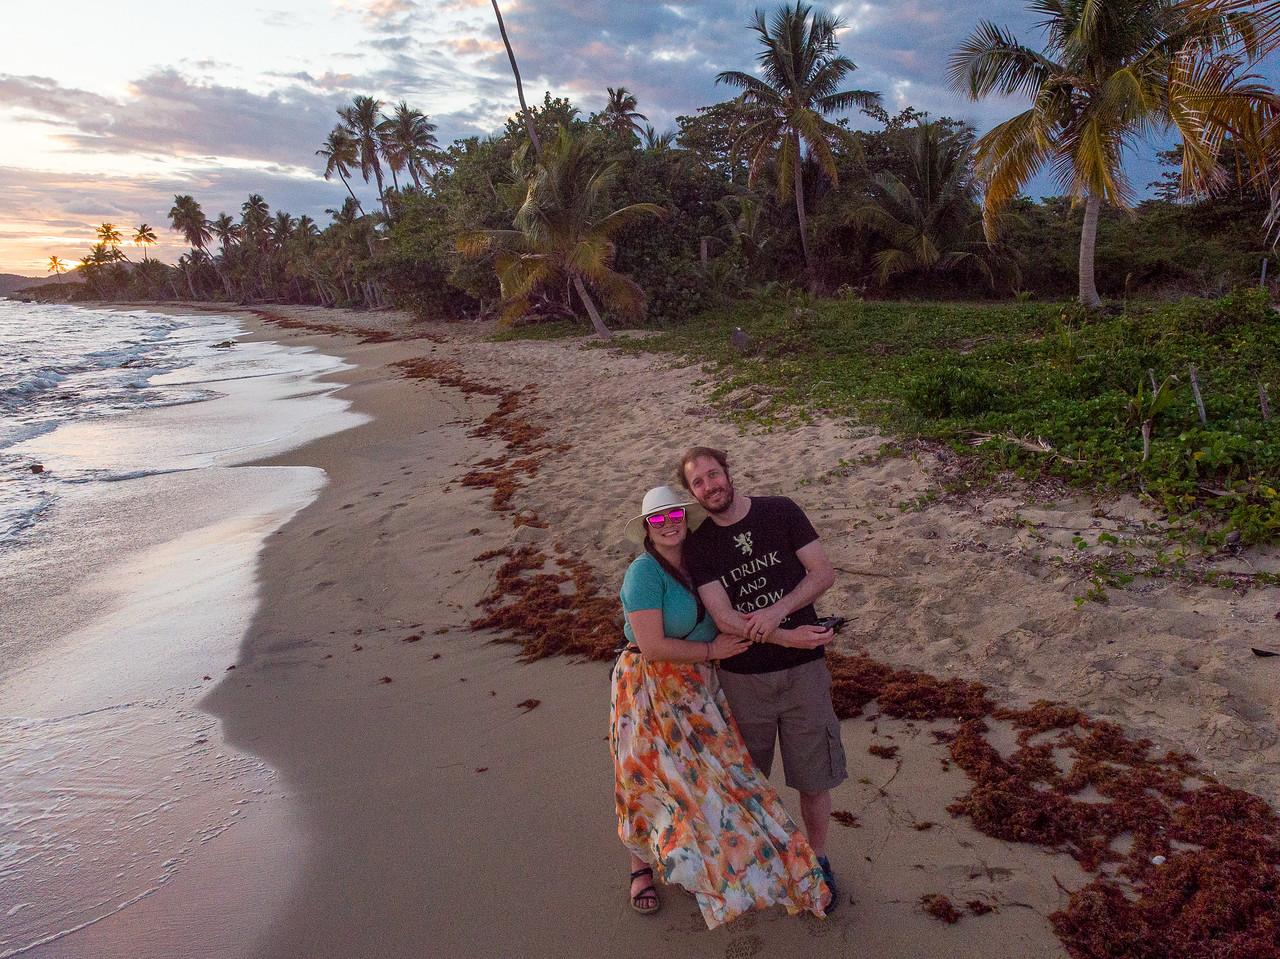 Coconut Beach on Vieques, Puerto Rico